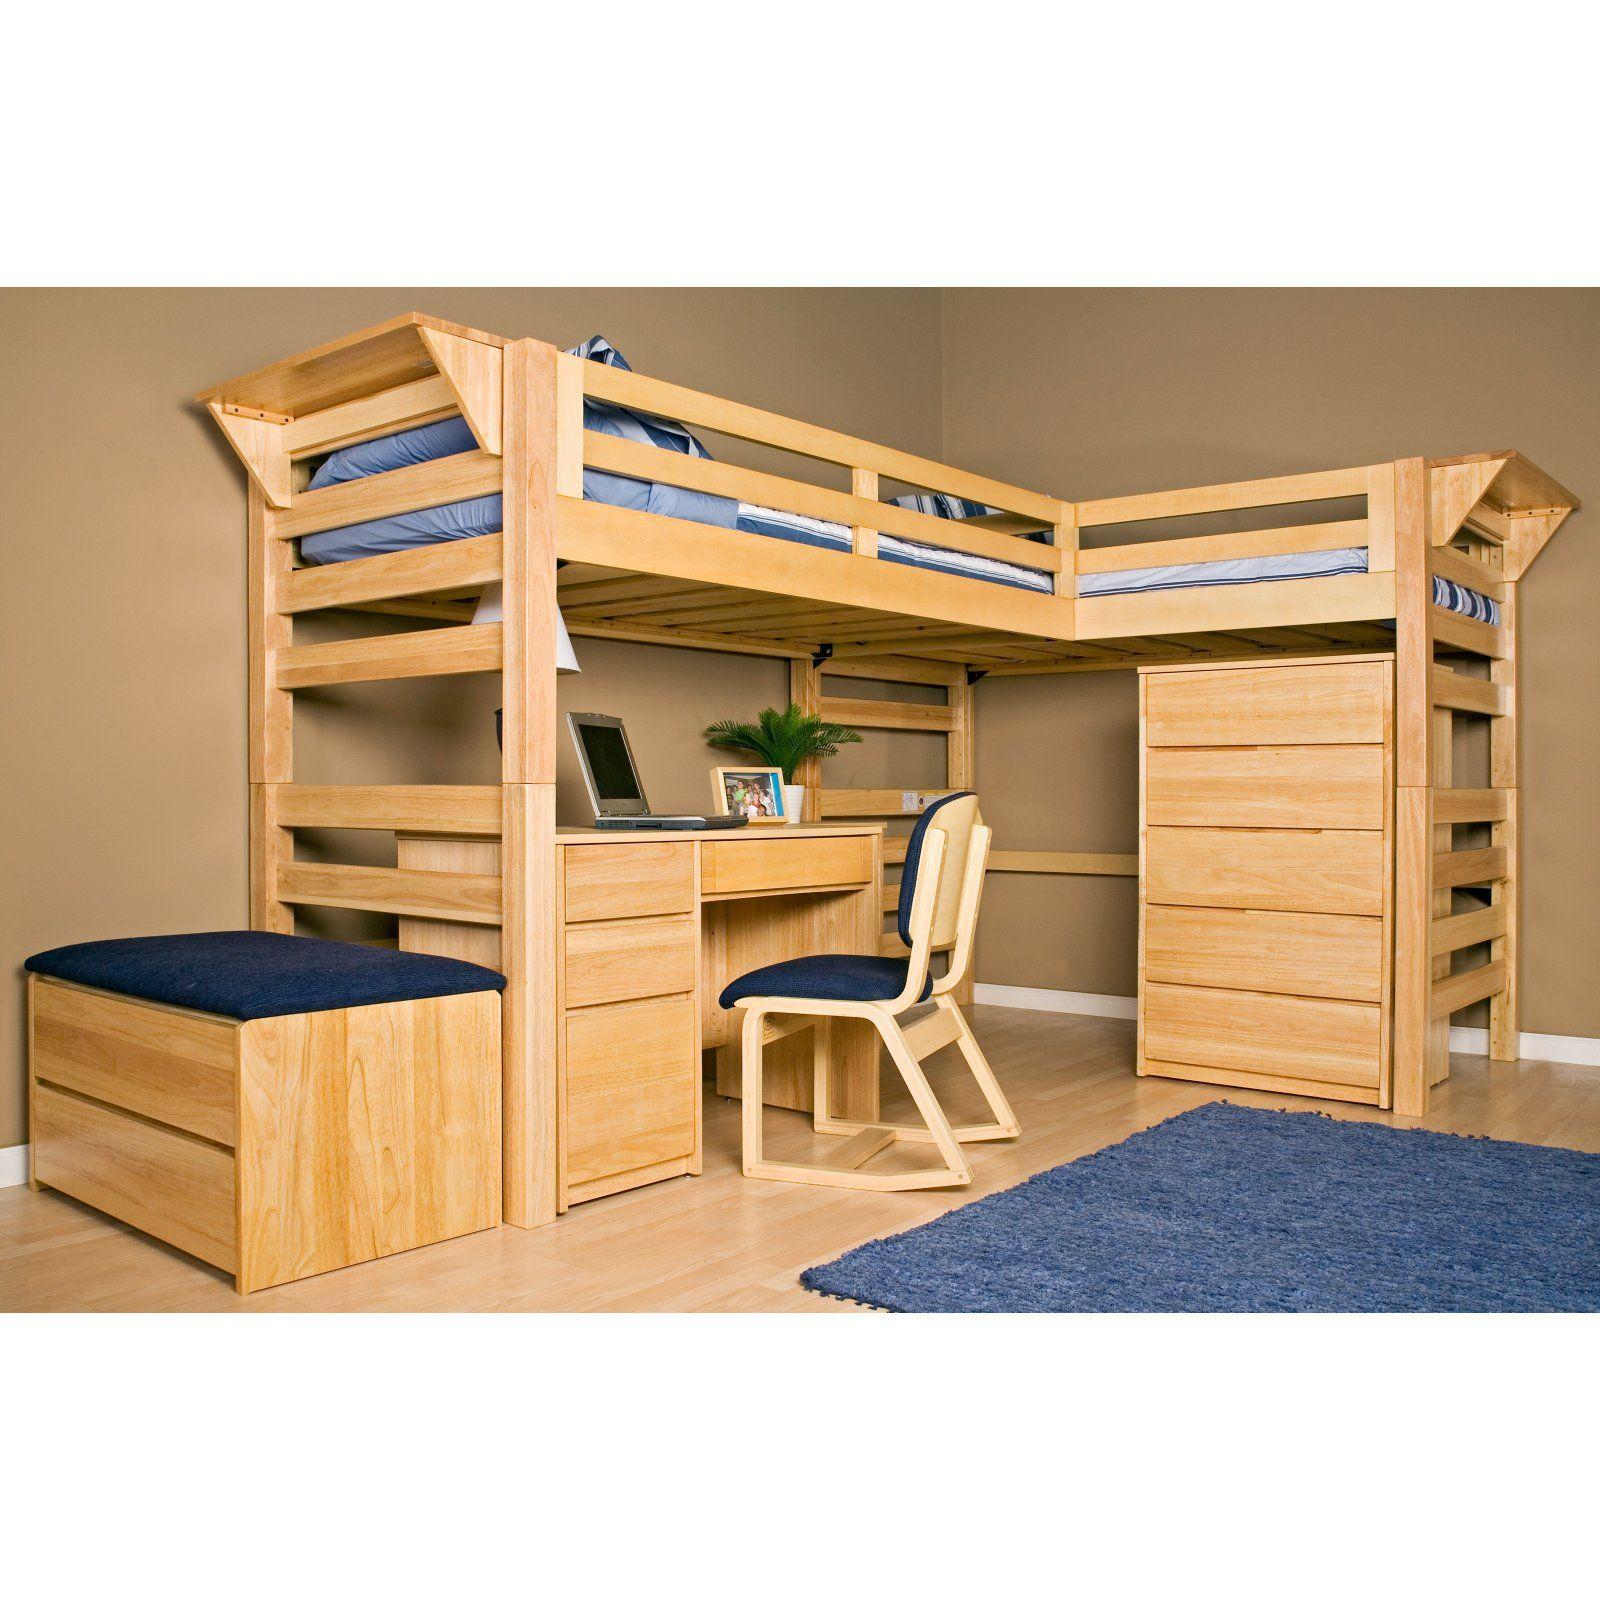 Graduate Series Triple Lindy Twin XL Loft Bed Decoración